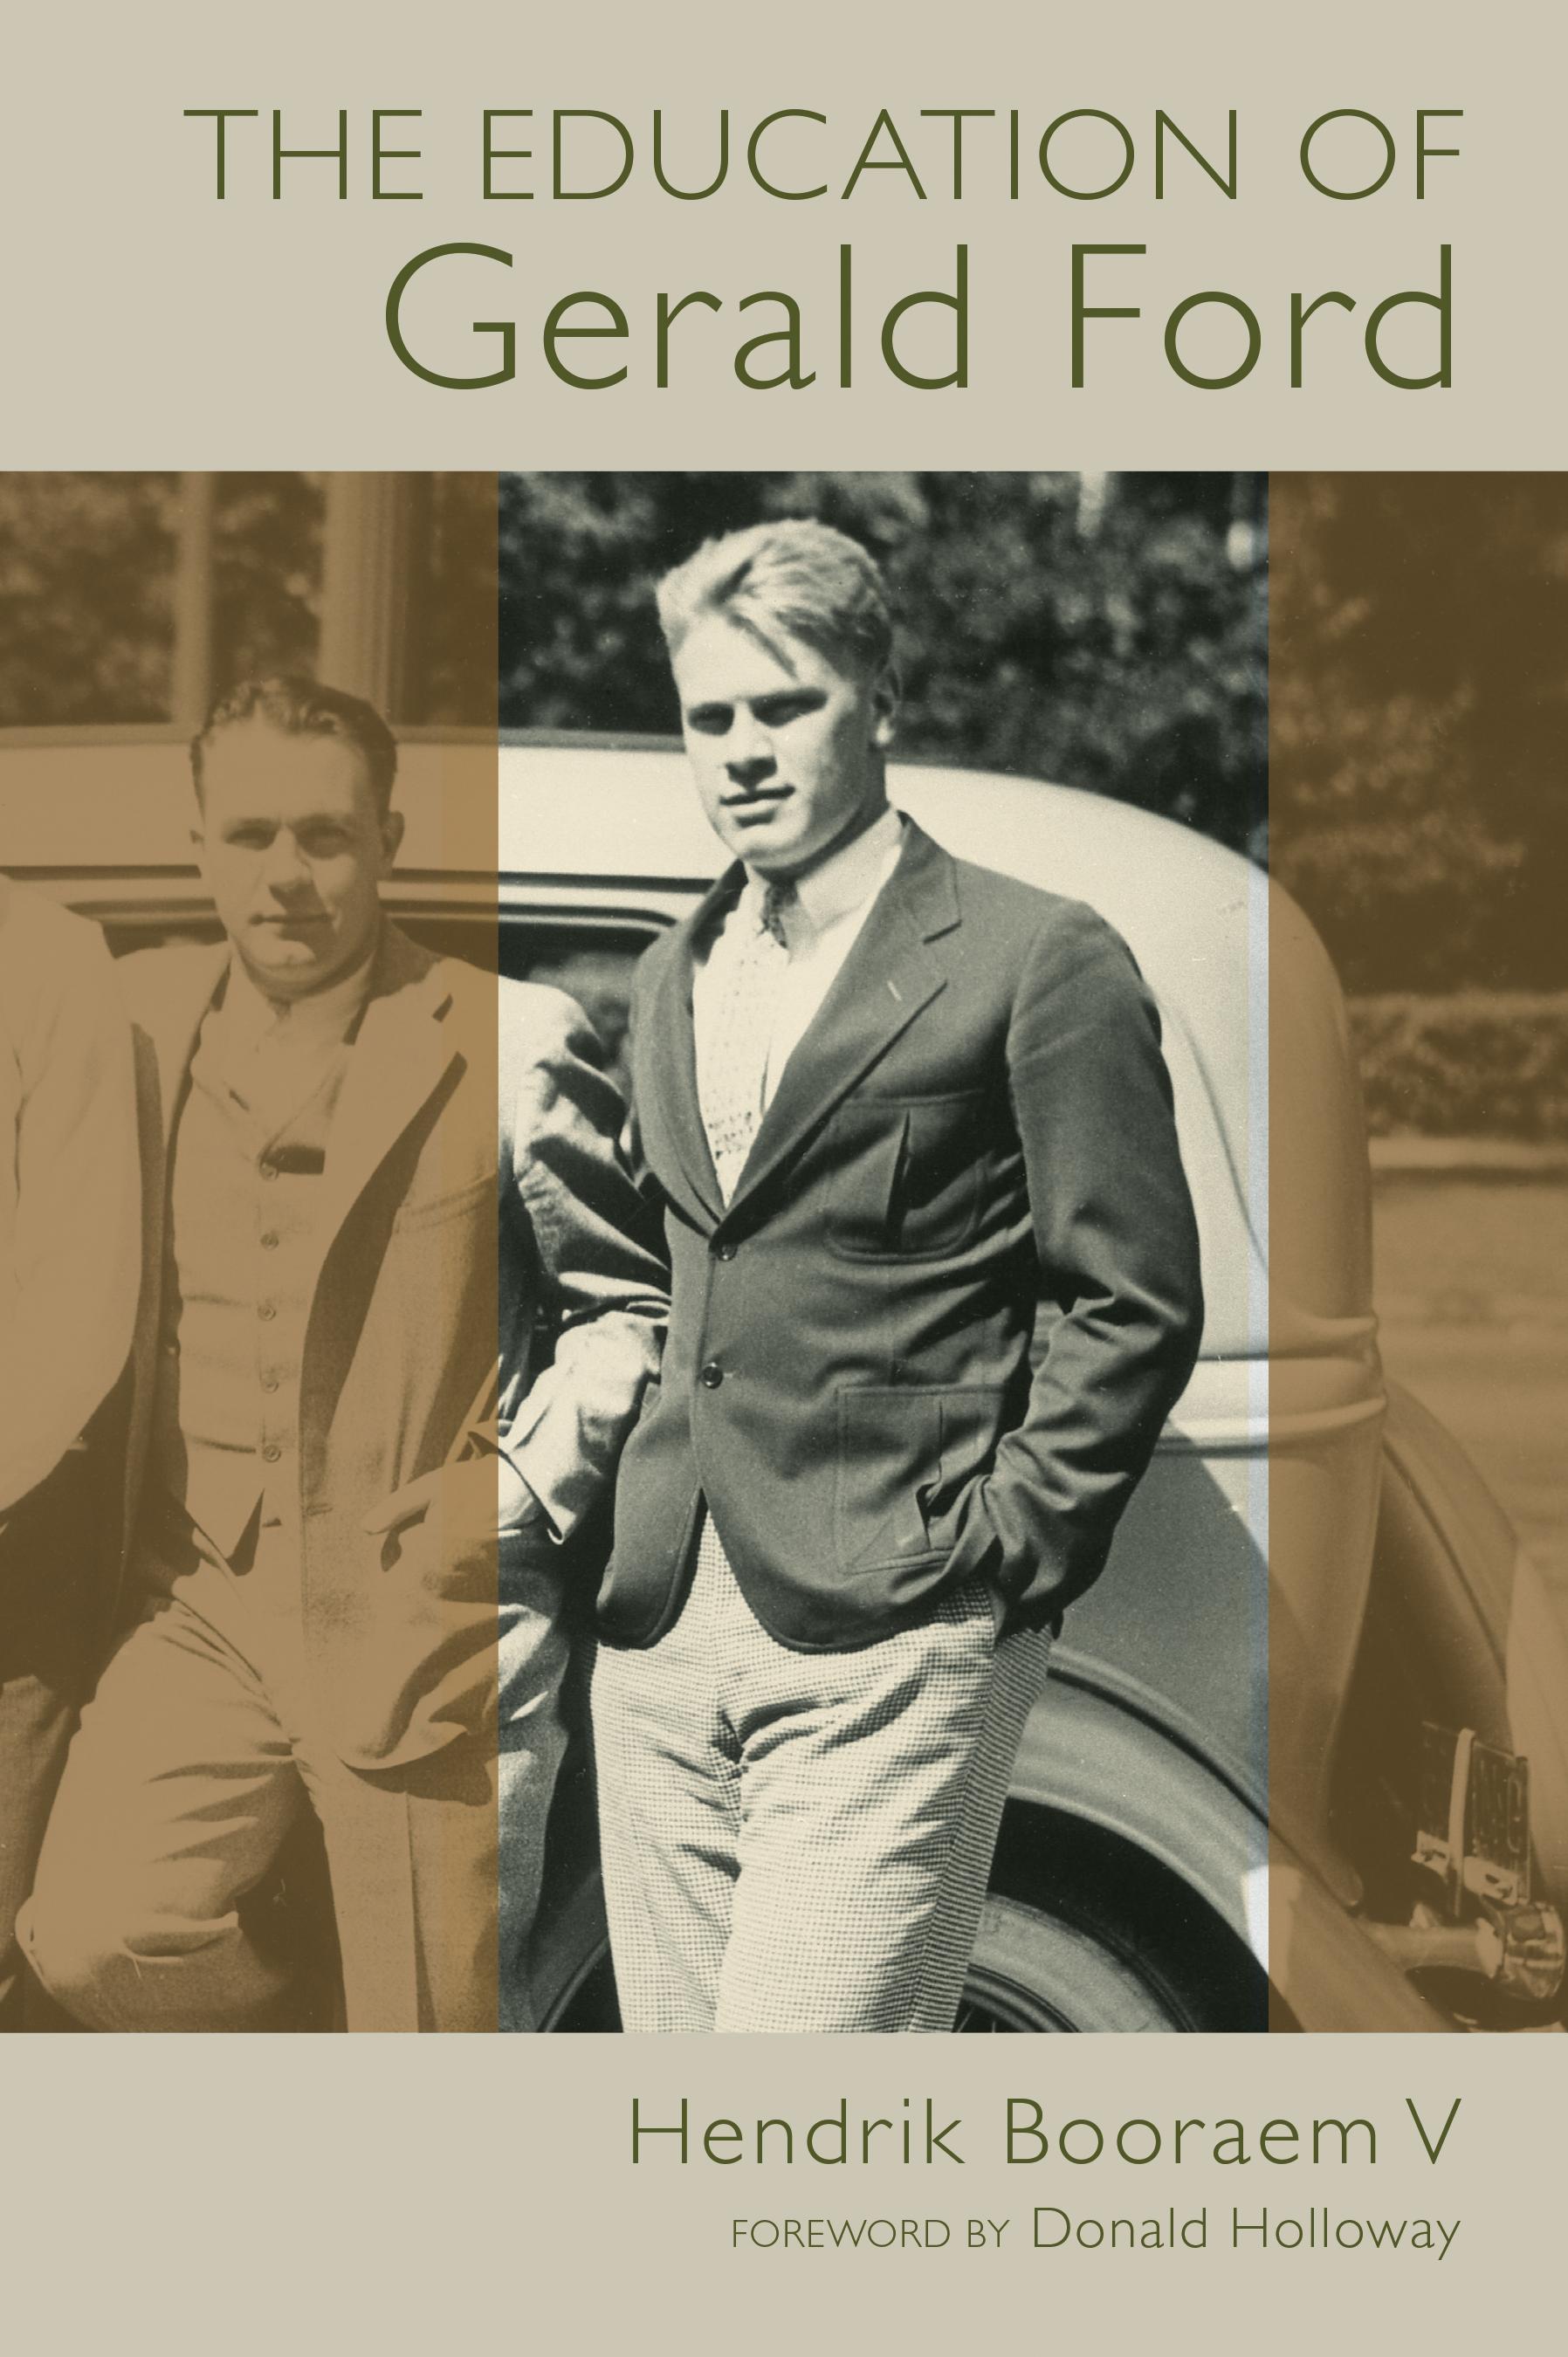 The Education Of Gerald Ford Hendrik Booraem V Eerdmans